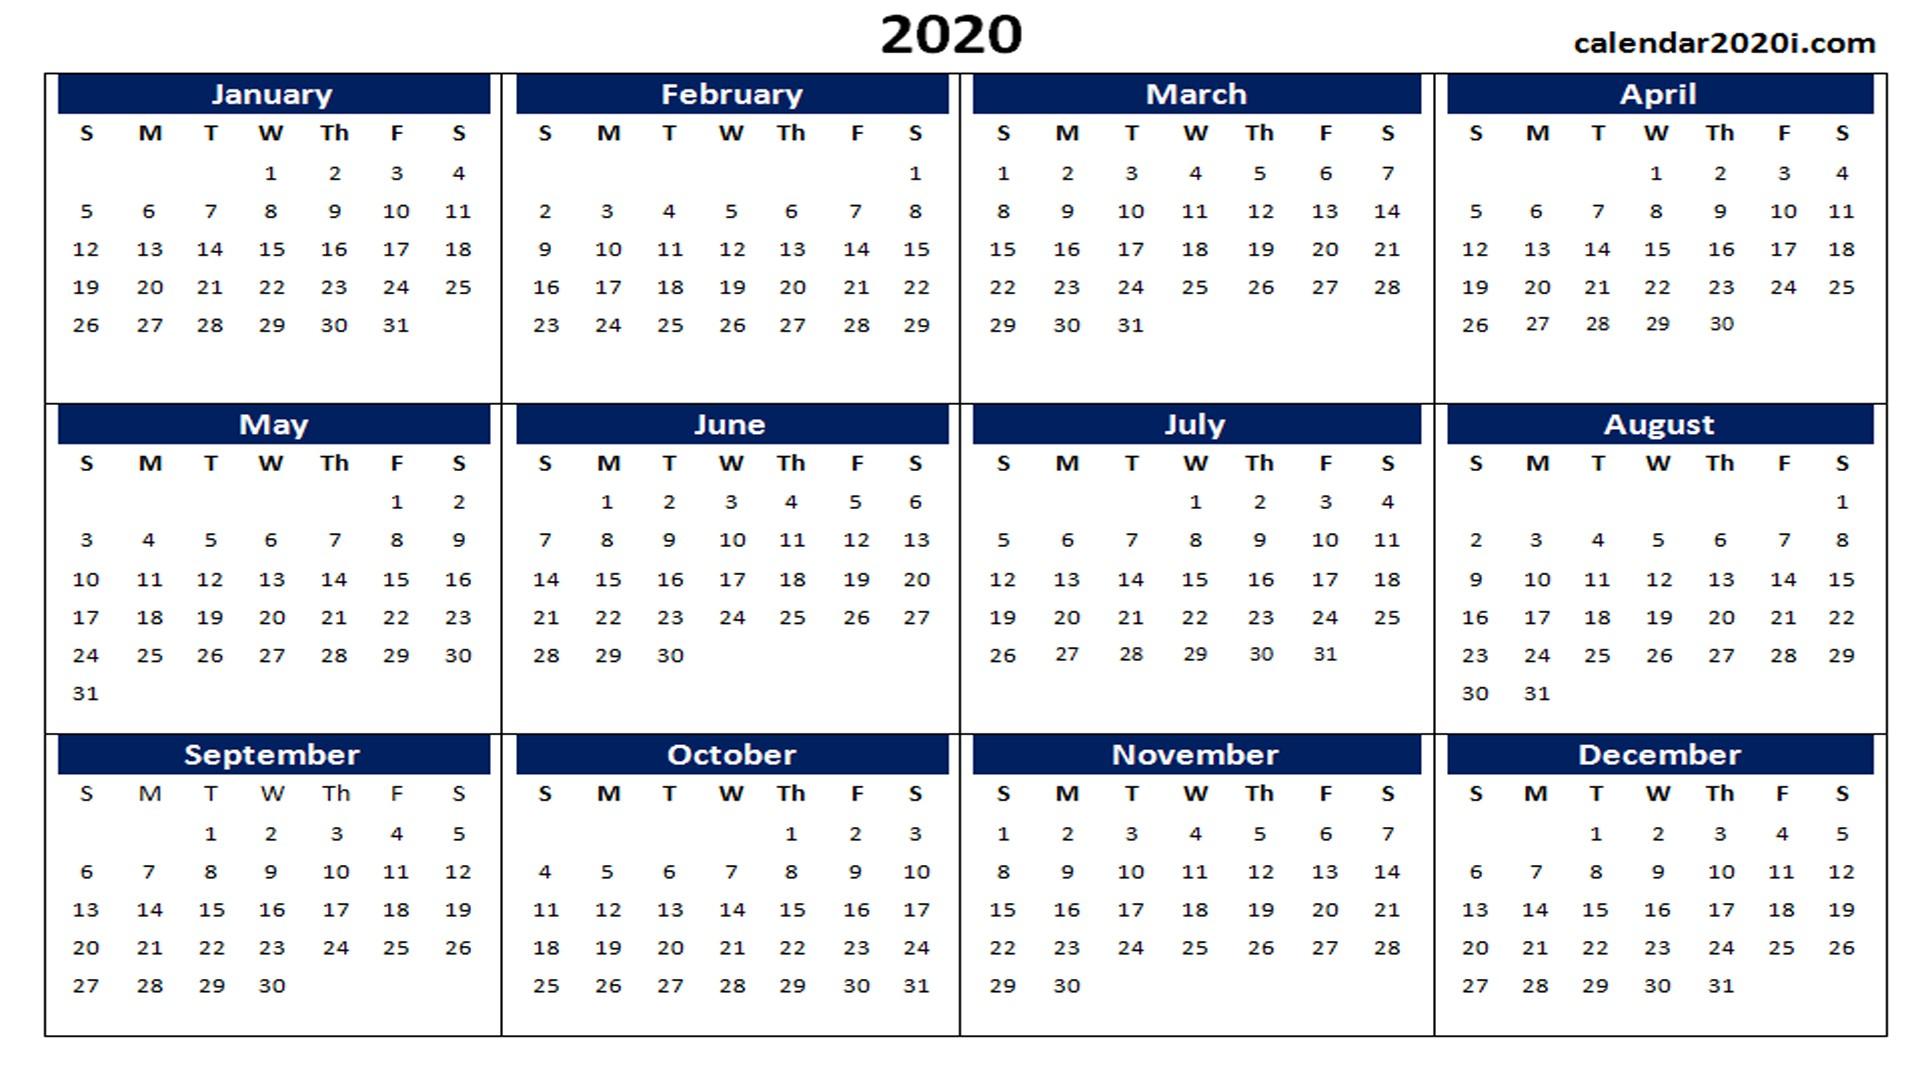 2020 Calendar Printable Word